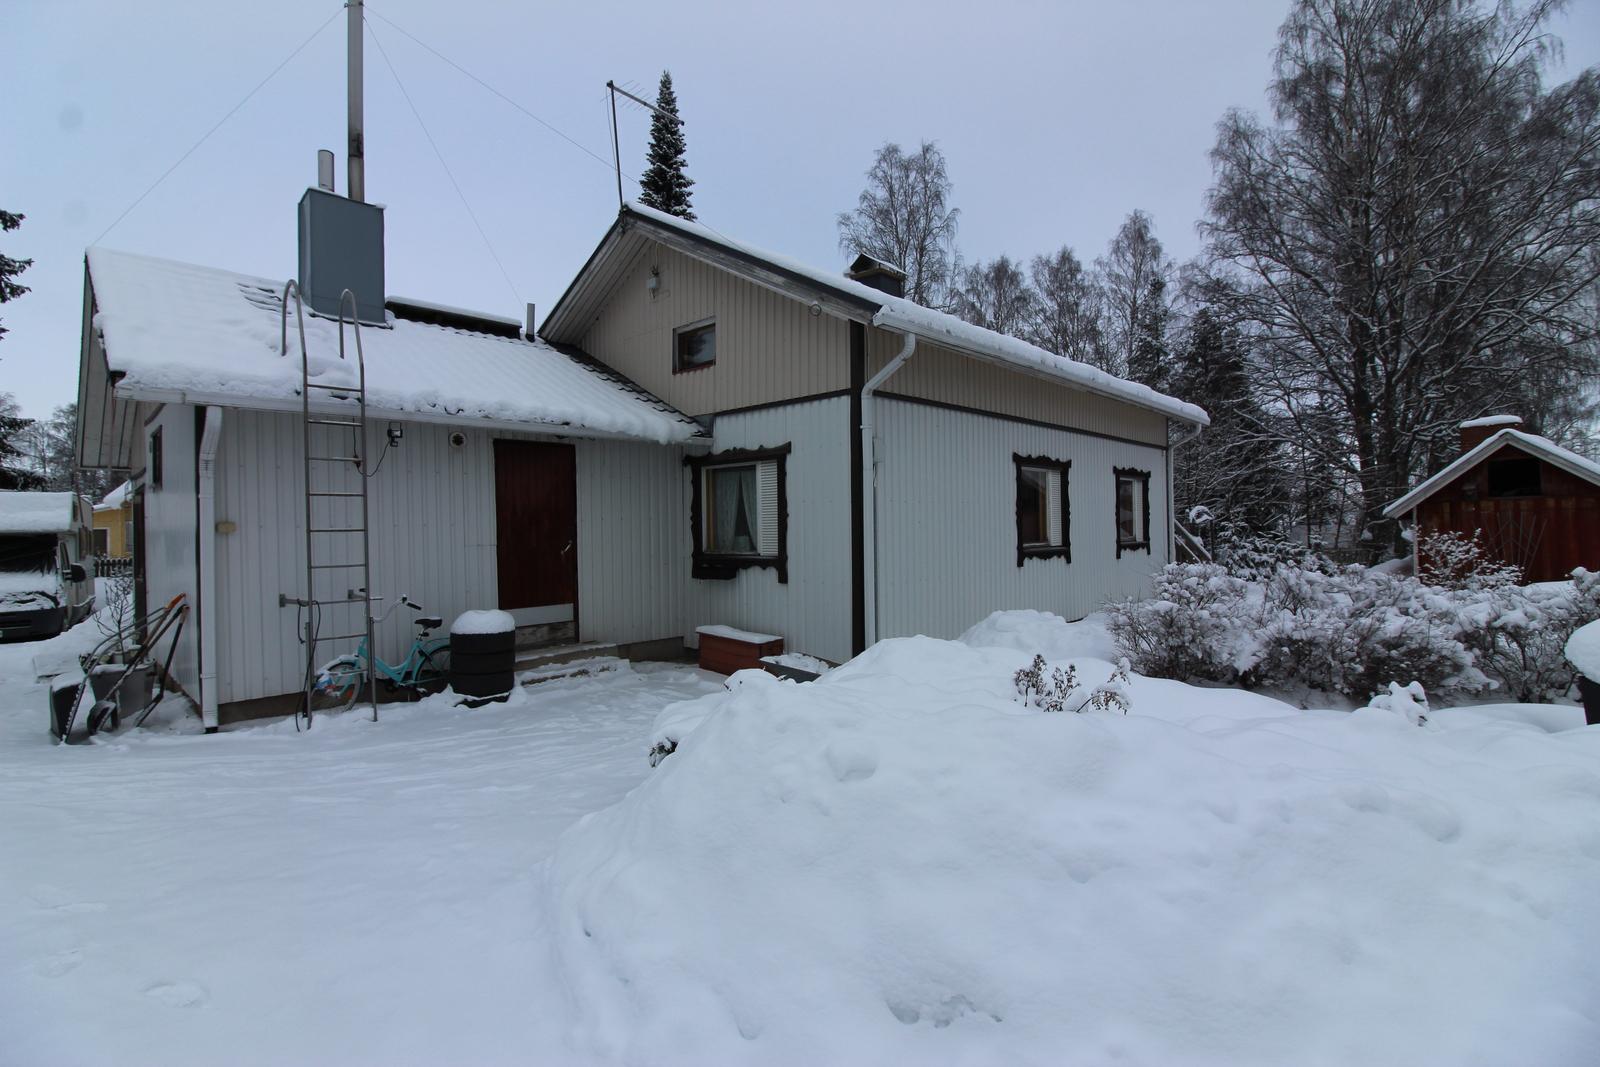 Joutseno / Honkalahti, Lappeenranta